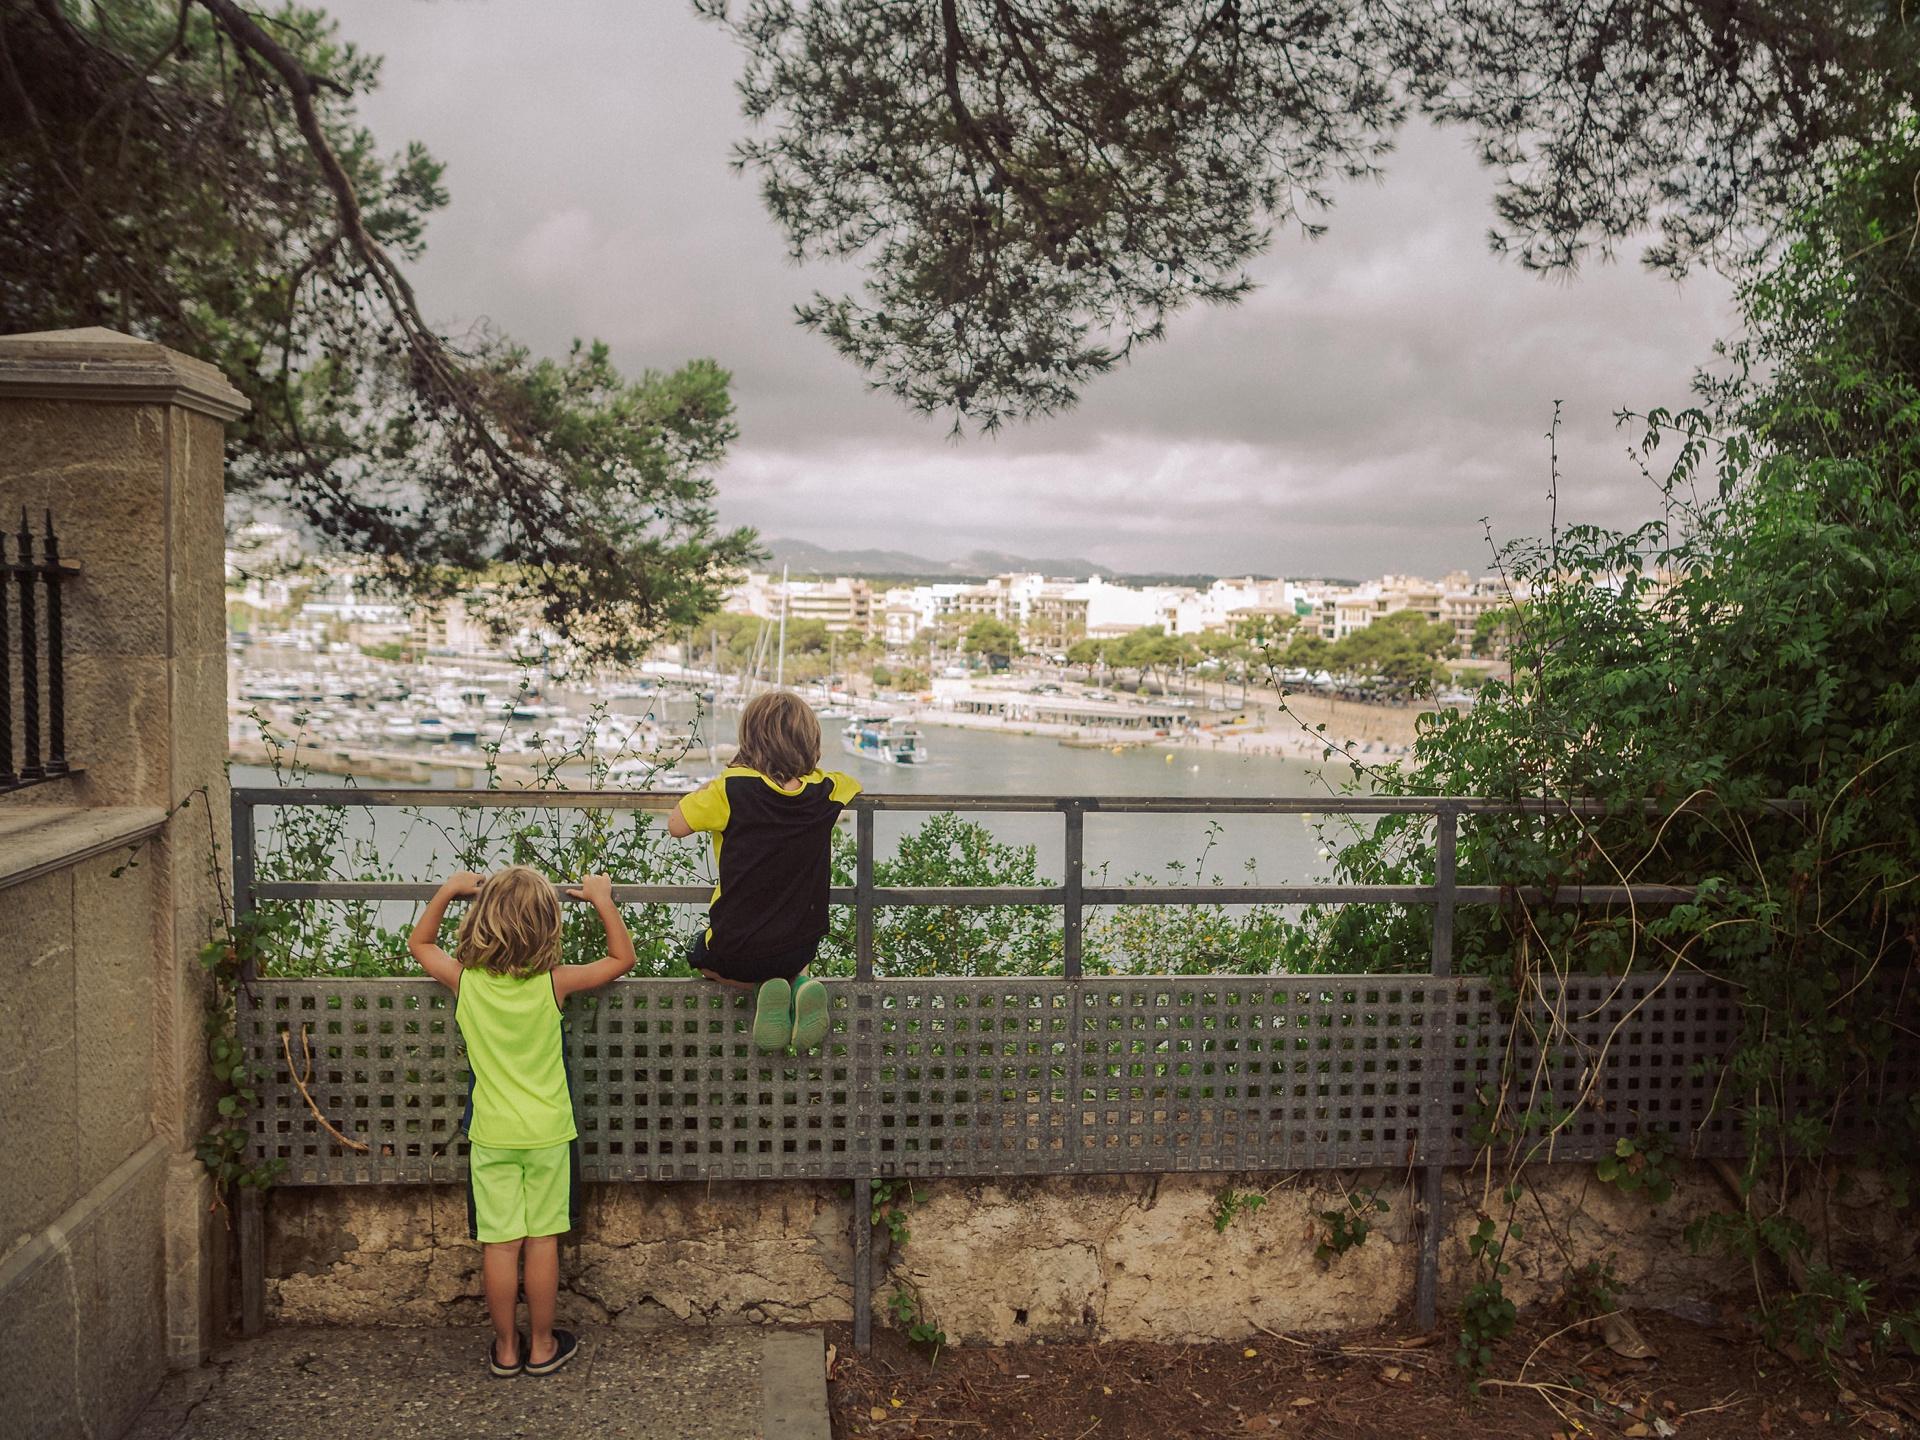 Sightseeing Porto Cristo